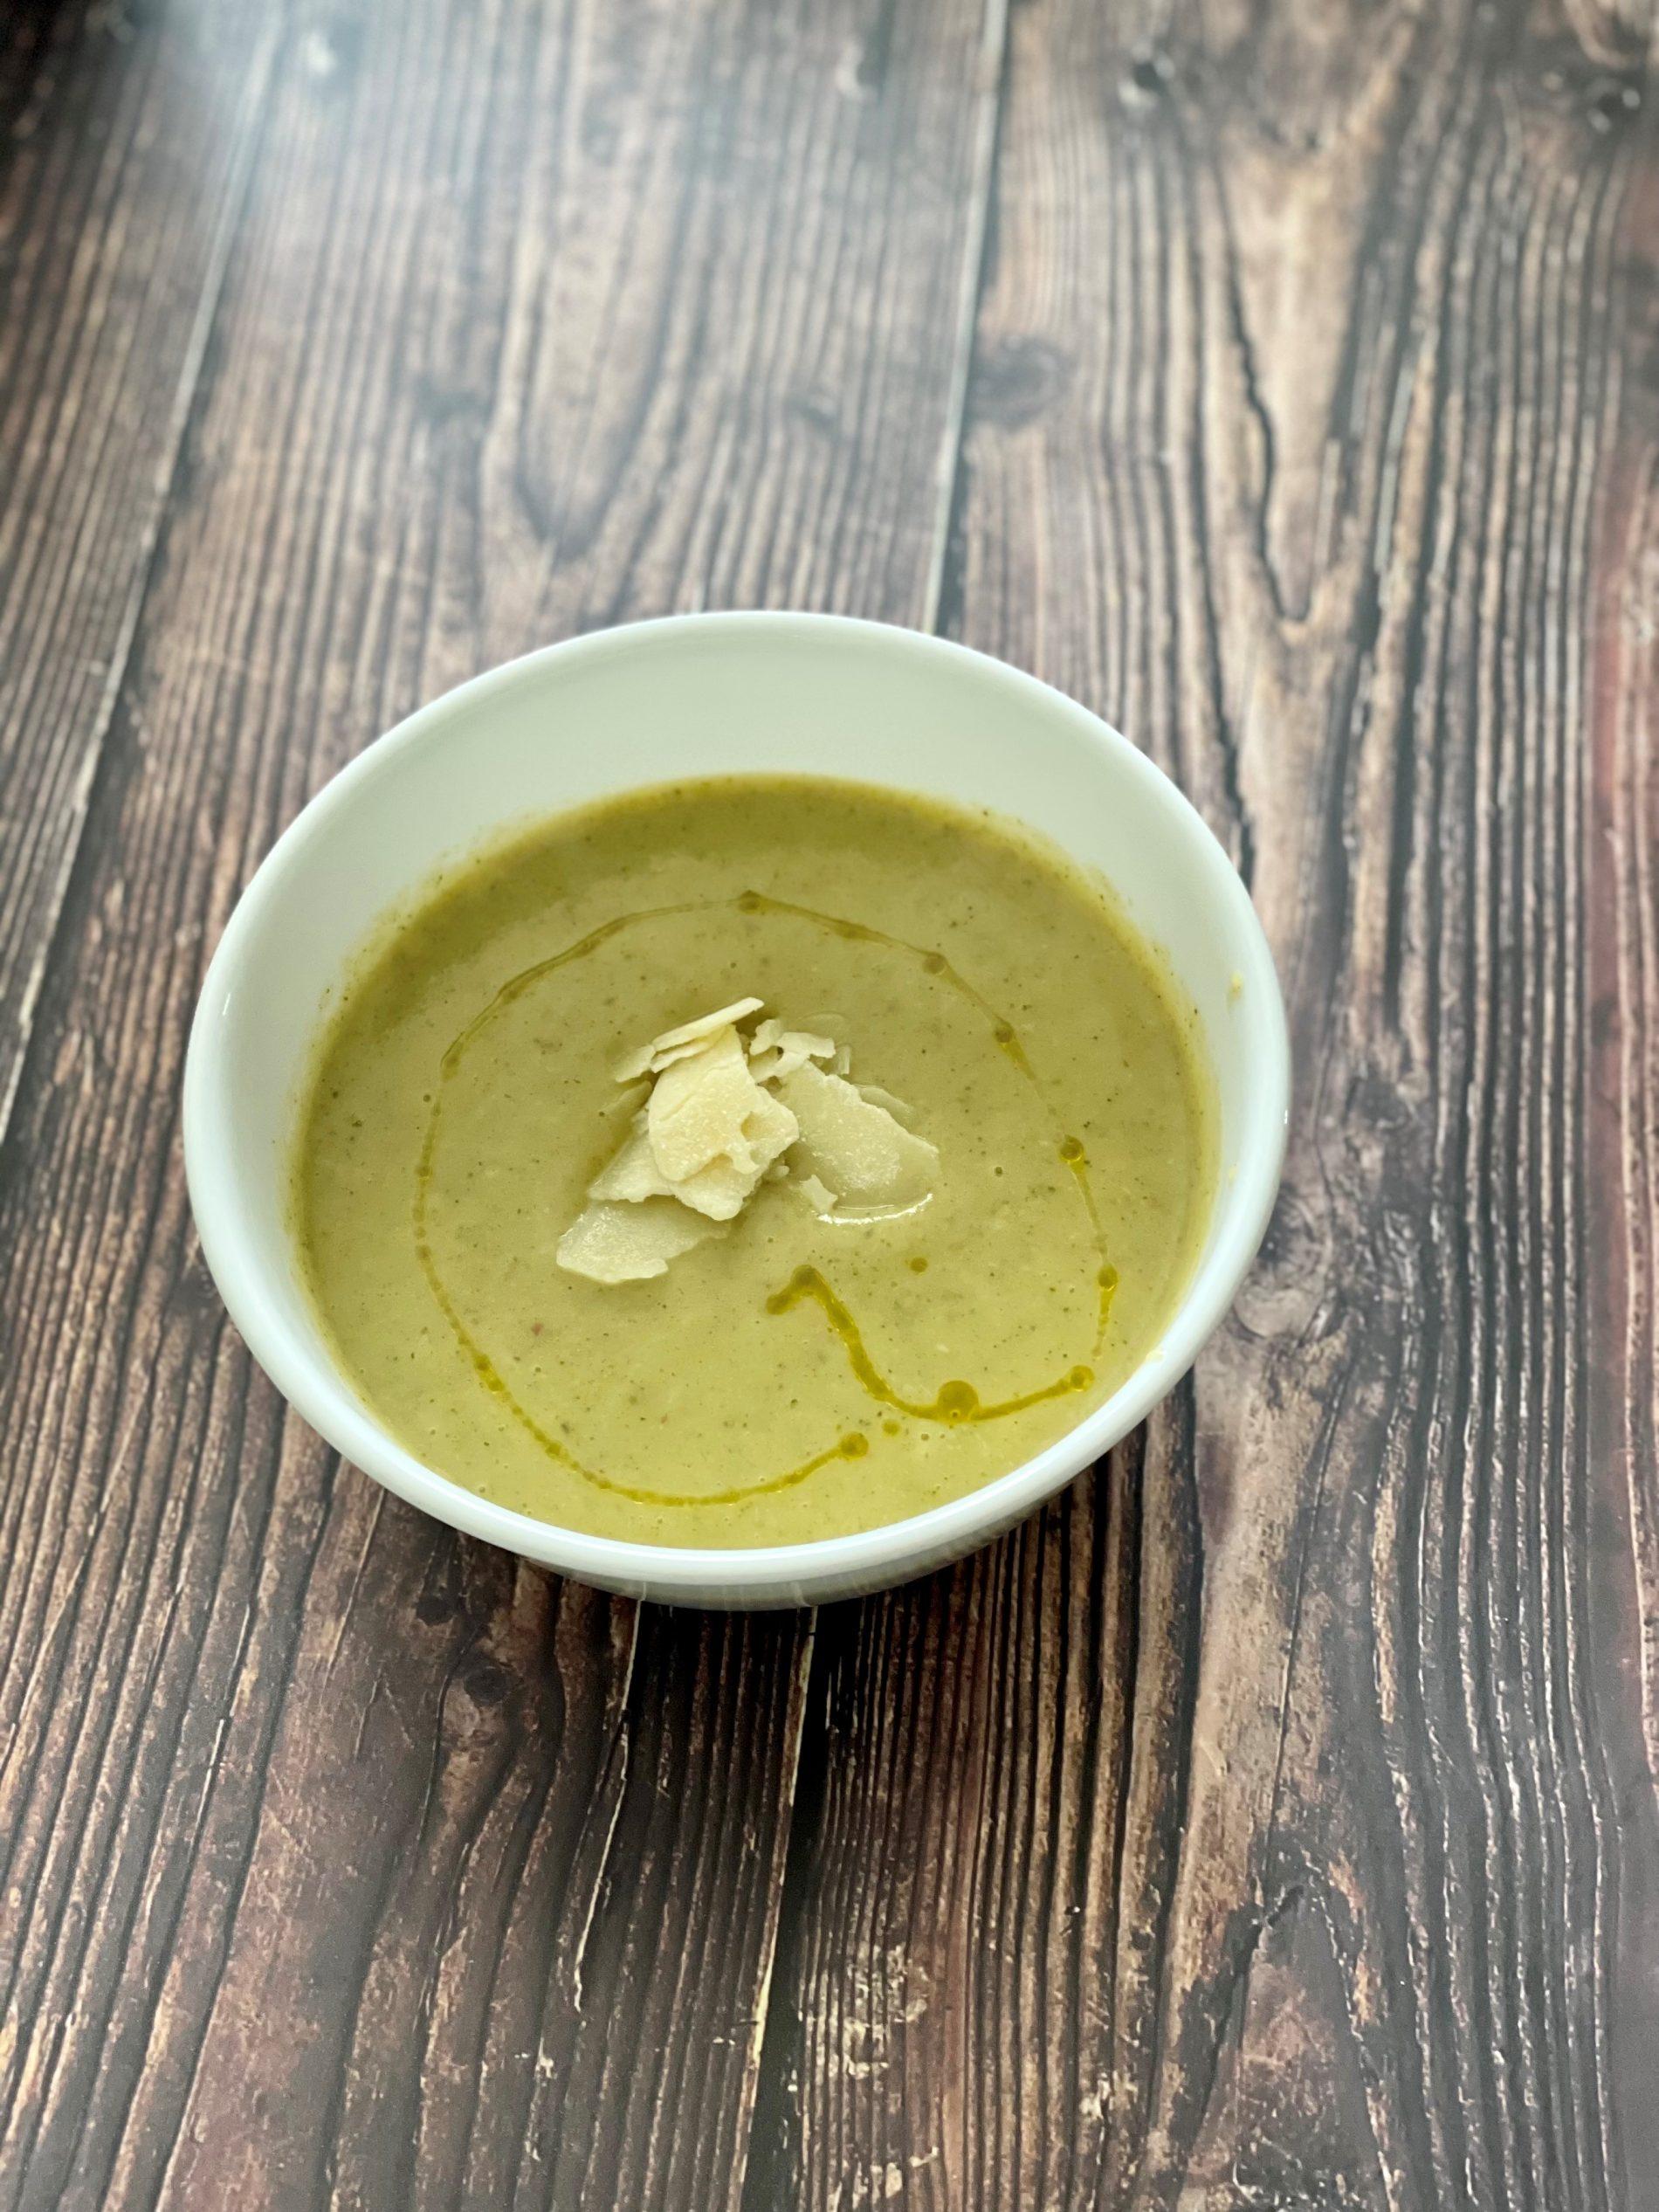 edmonton yeg creamy broccoli soup